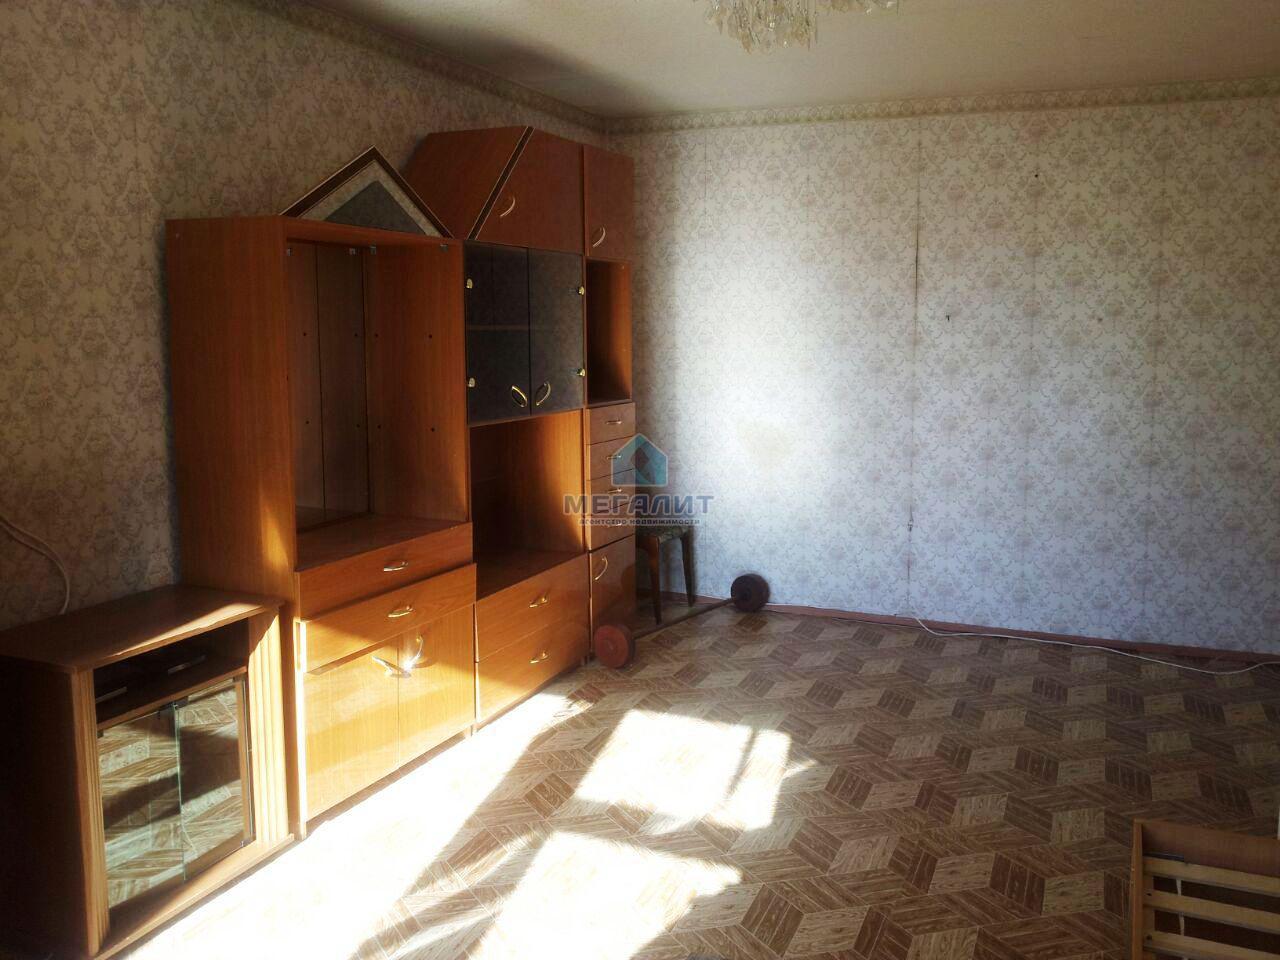 Двухкомнатная квартира в Ново-Савиновском районе! (миниатюра №4)